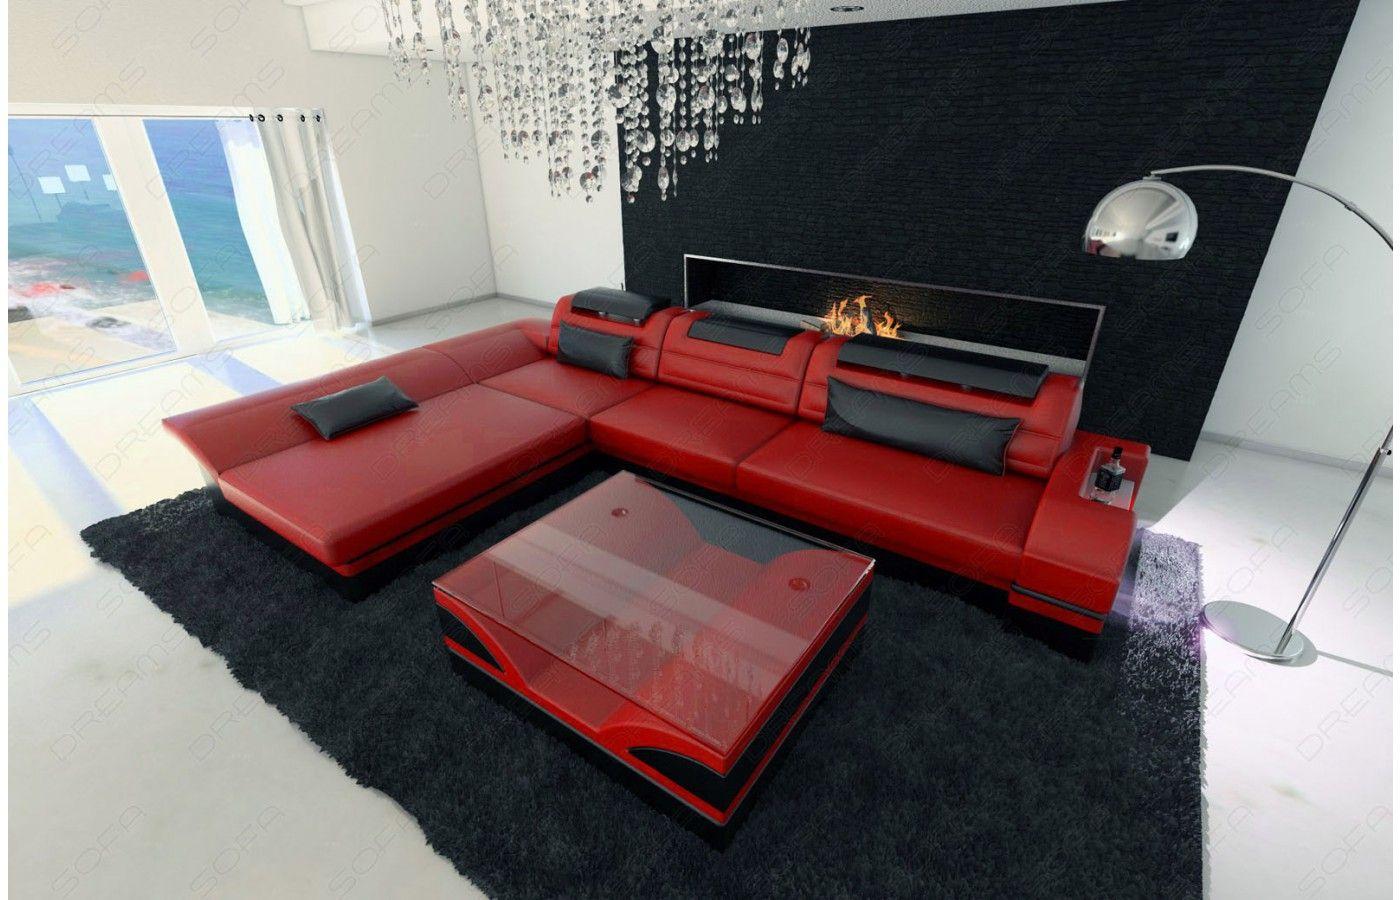 Designer Ledersofa Monza L Form In Rot-schwarz - Exklusiv Bei ... Couch L Form